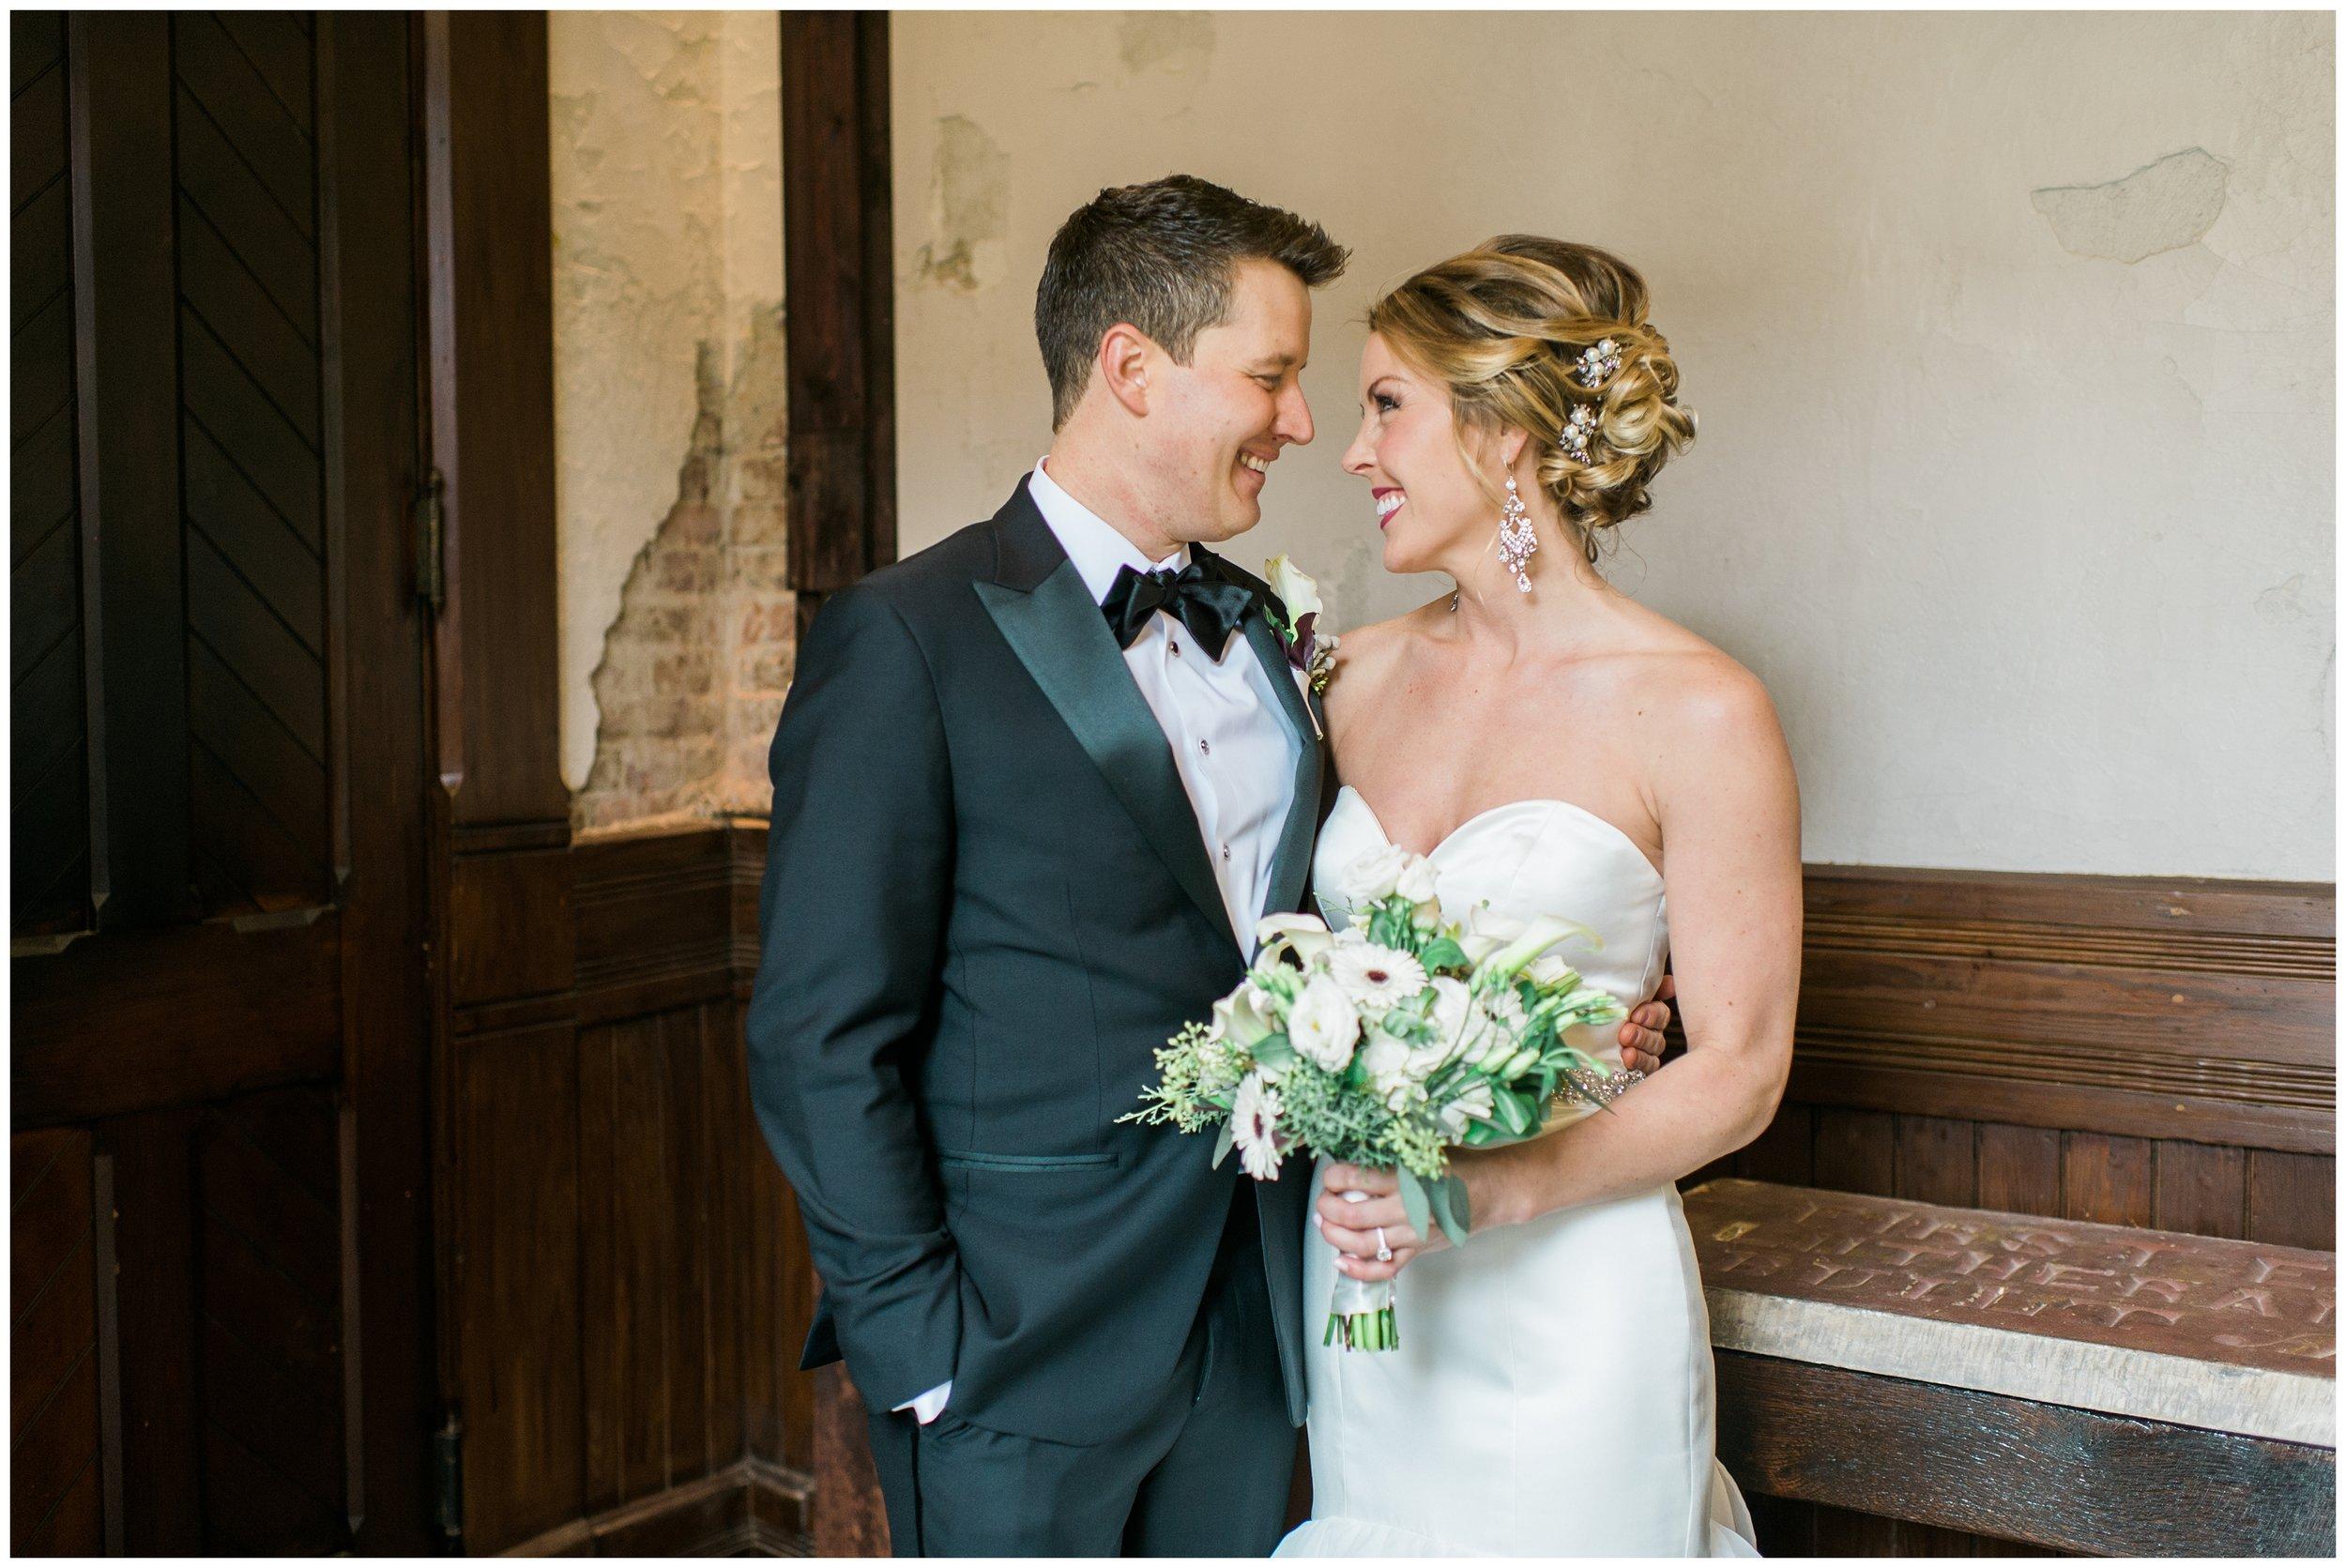 Rebecca_Bridges_Photography_Indianapolis_Wedding_Photographer_5799.jpg